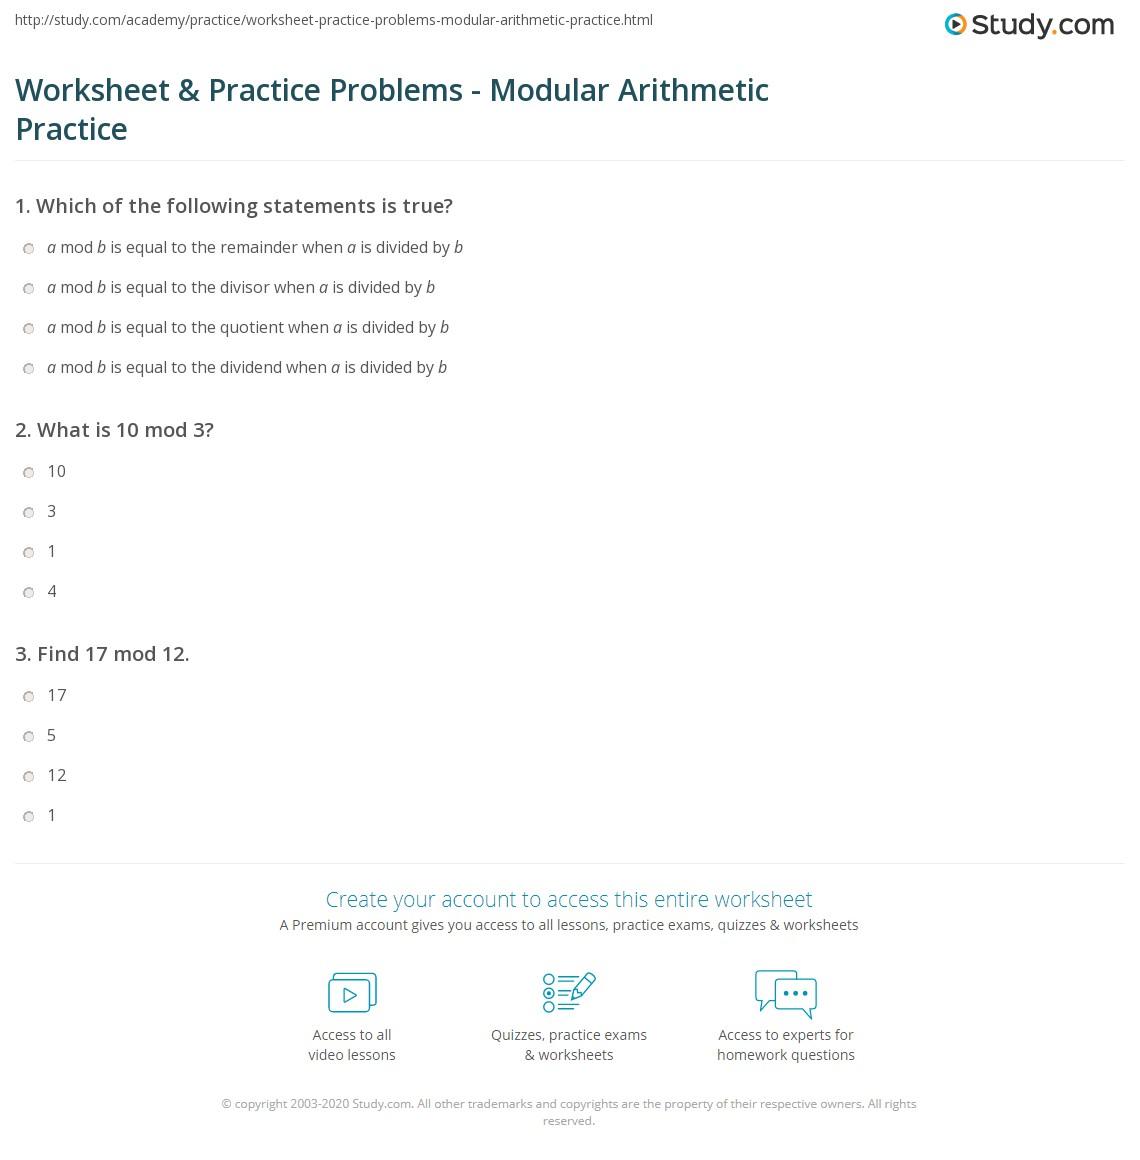 Worksheet & Practice Problems - Modular Arithmetic Practice | Study.com